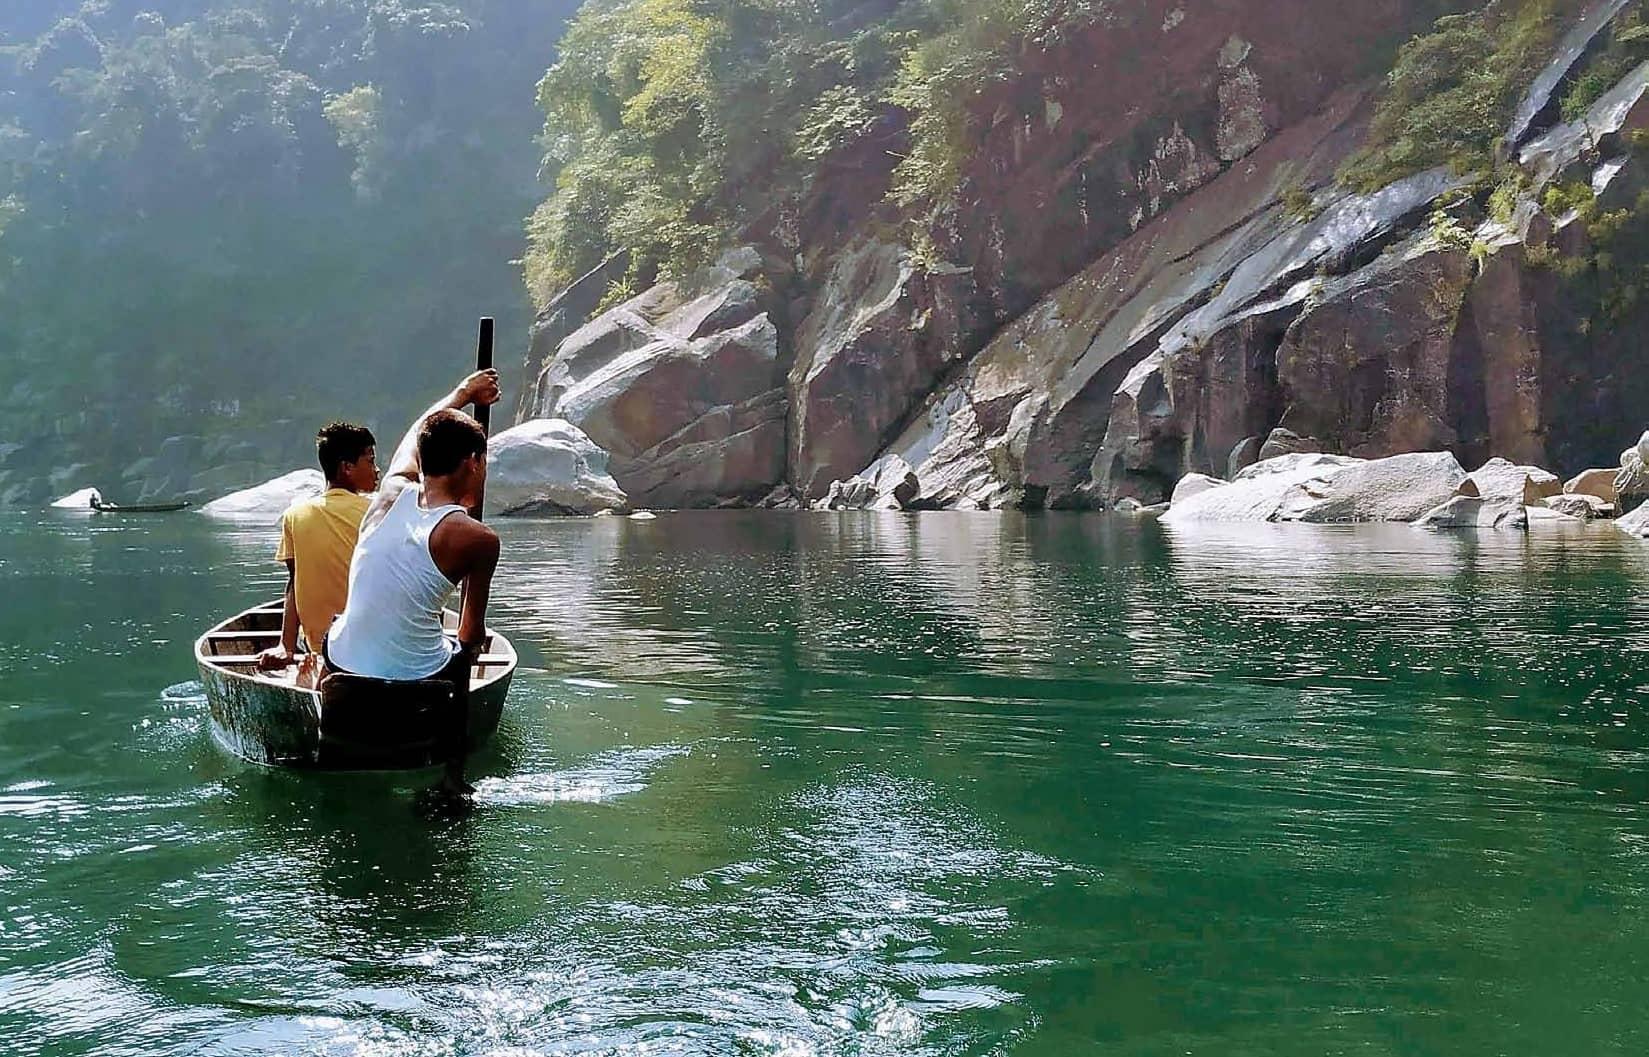 Meghalaya Of Beauty And Mysticism